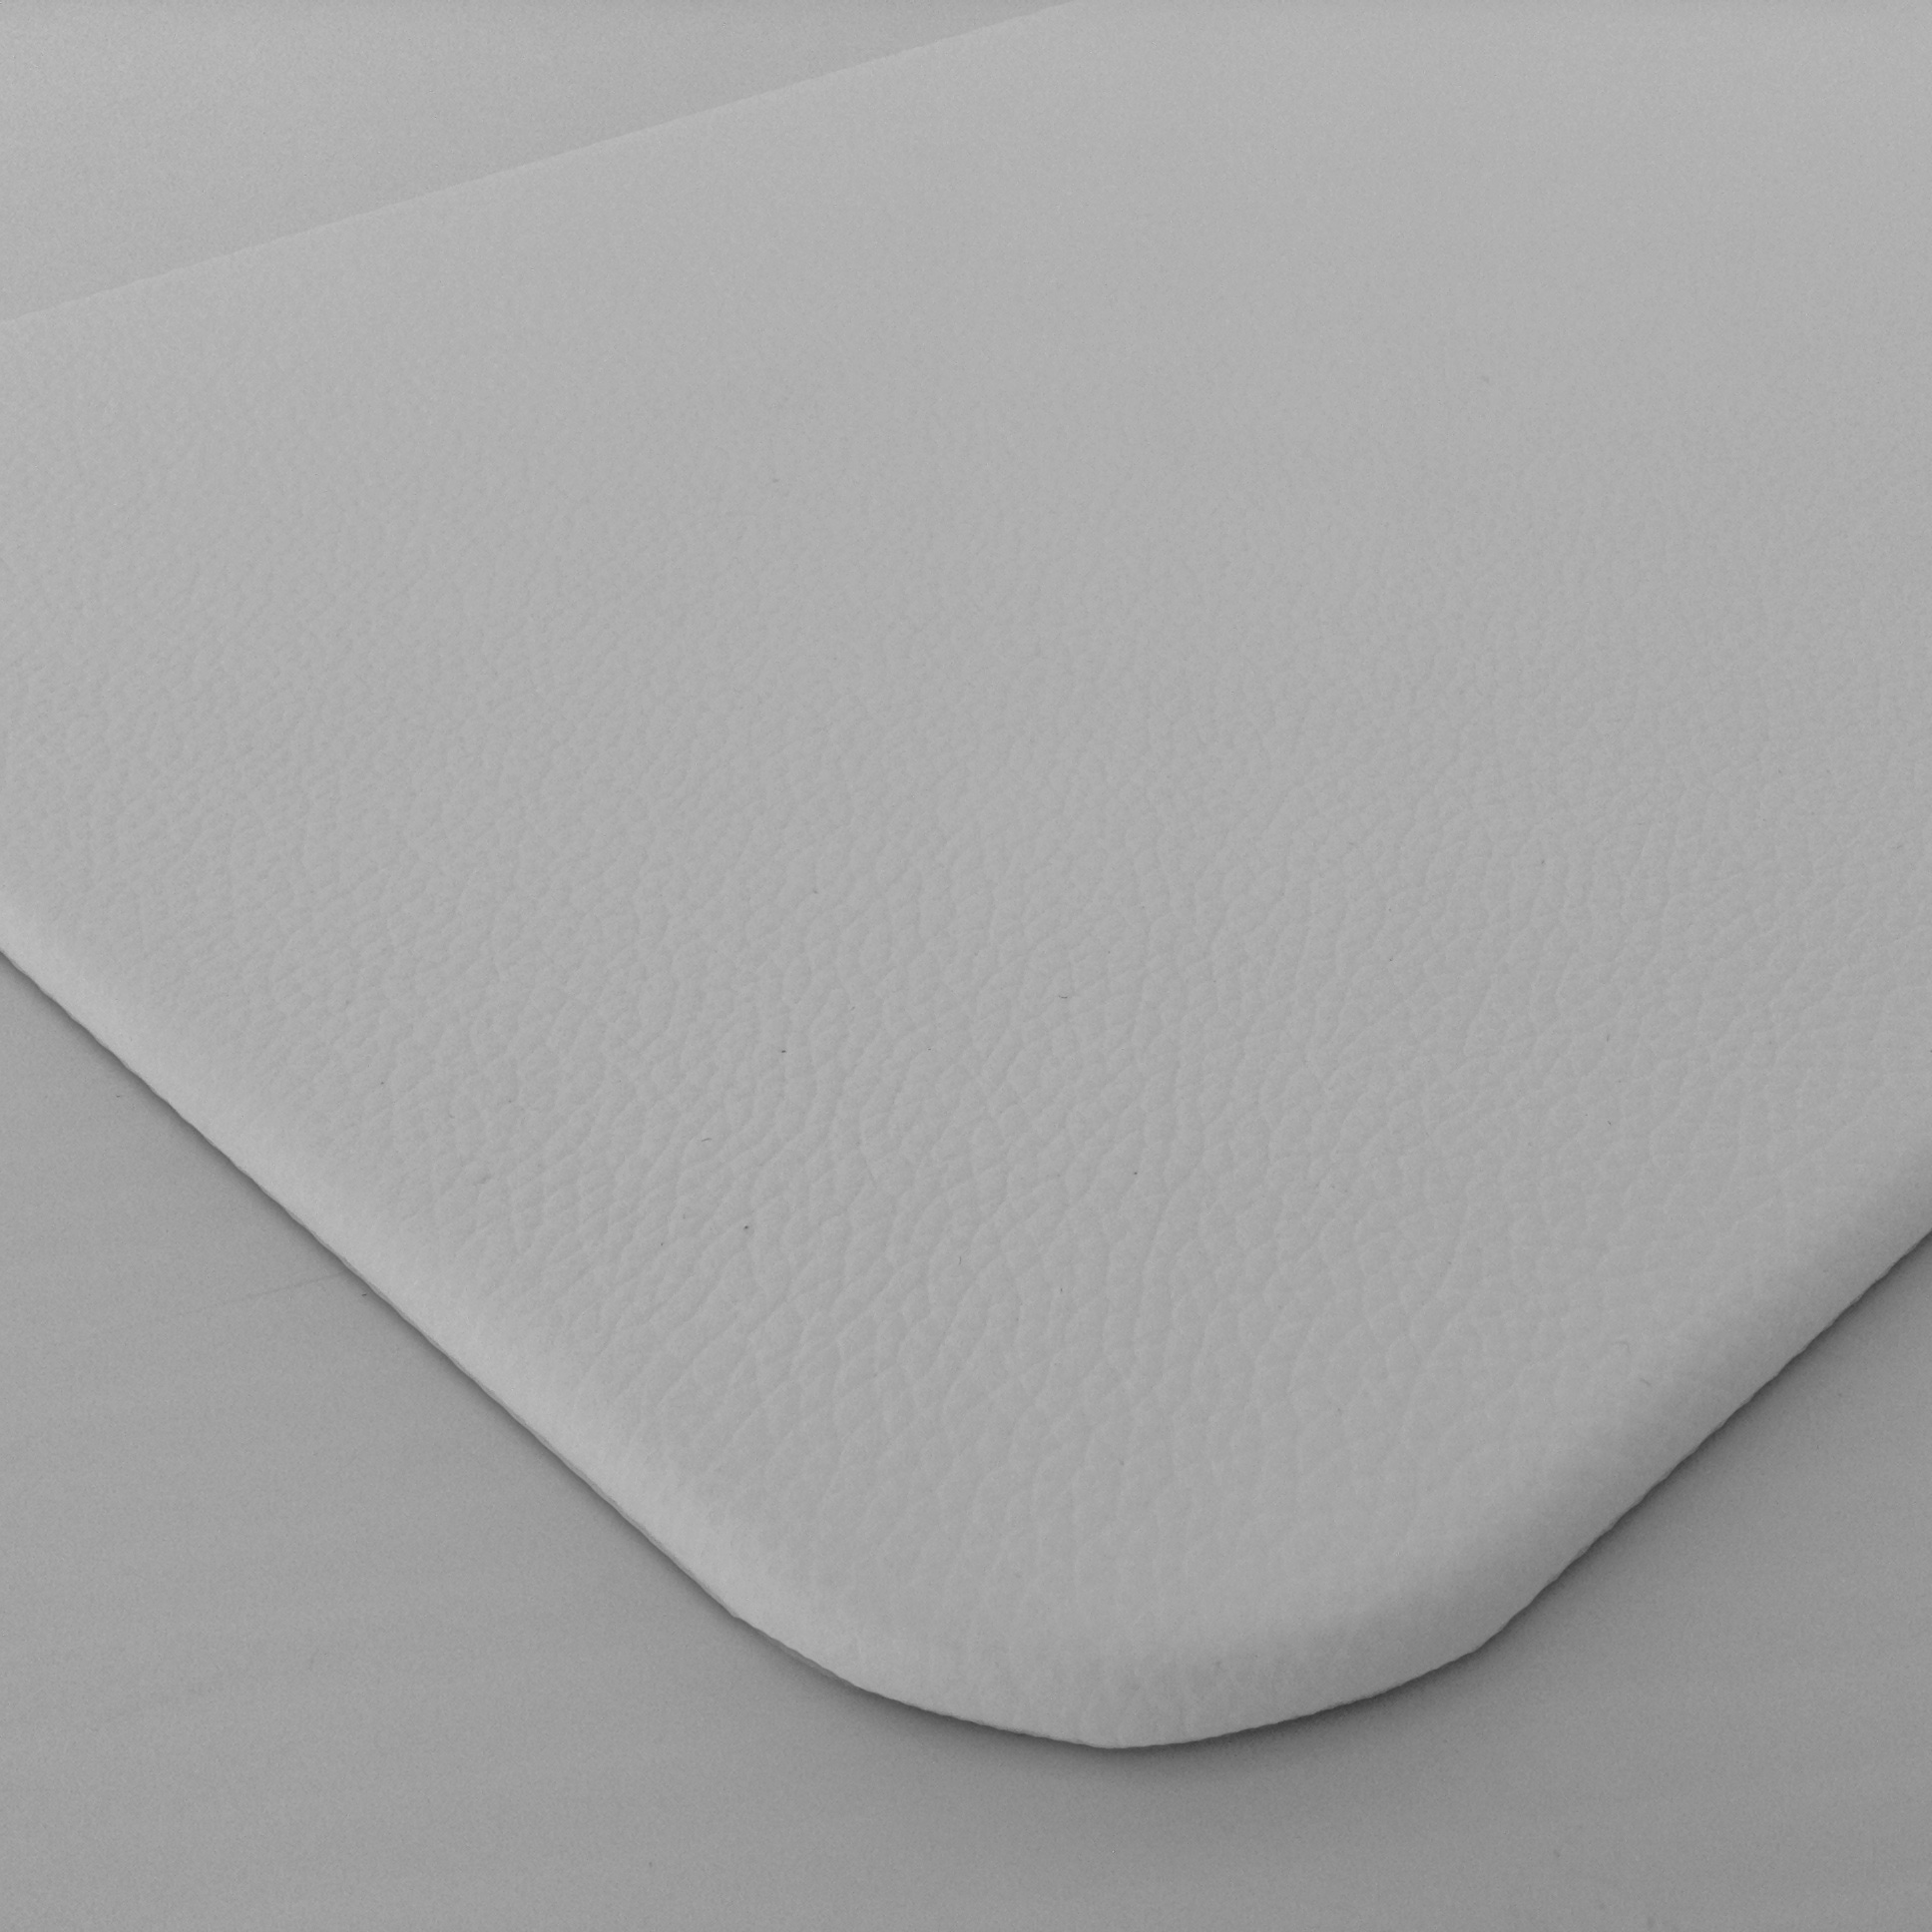 White Leather Desk Pad Genuine Leather Desktop Protection